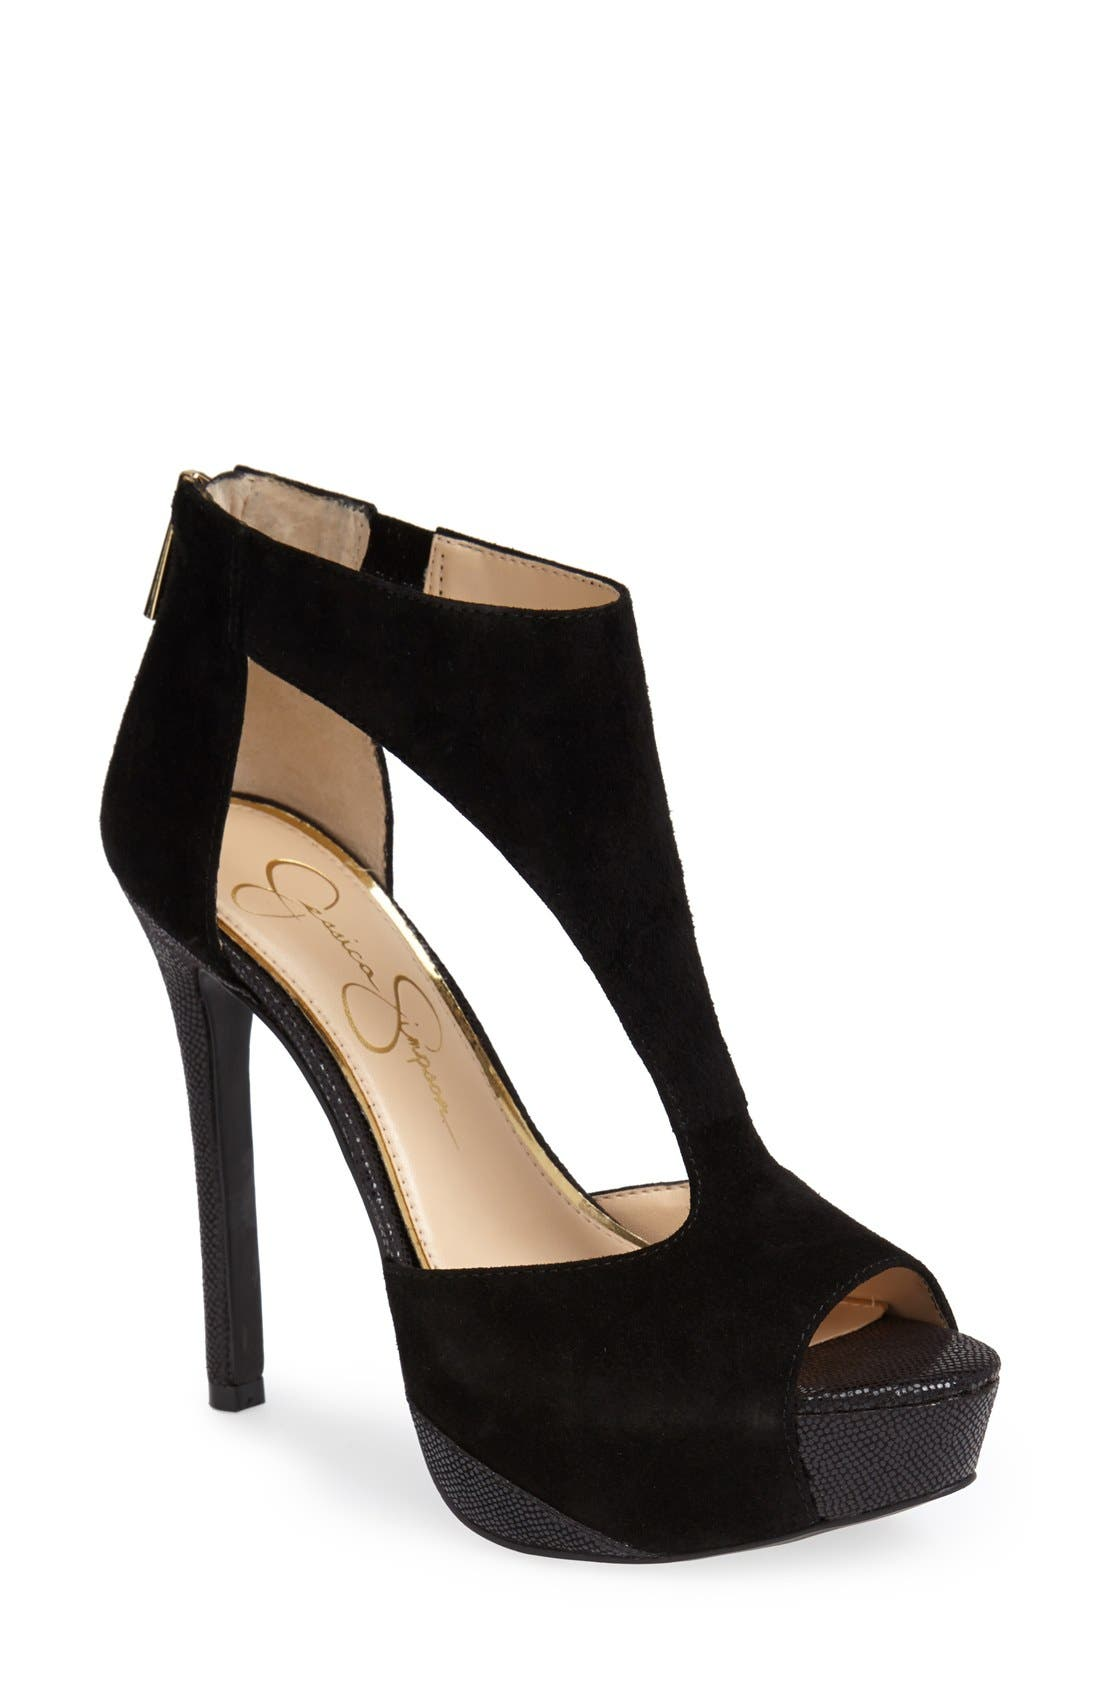 Main Image - Jessica Simpson 'Carideo' Platform Sandal (Women)